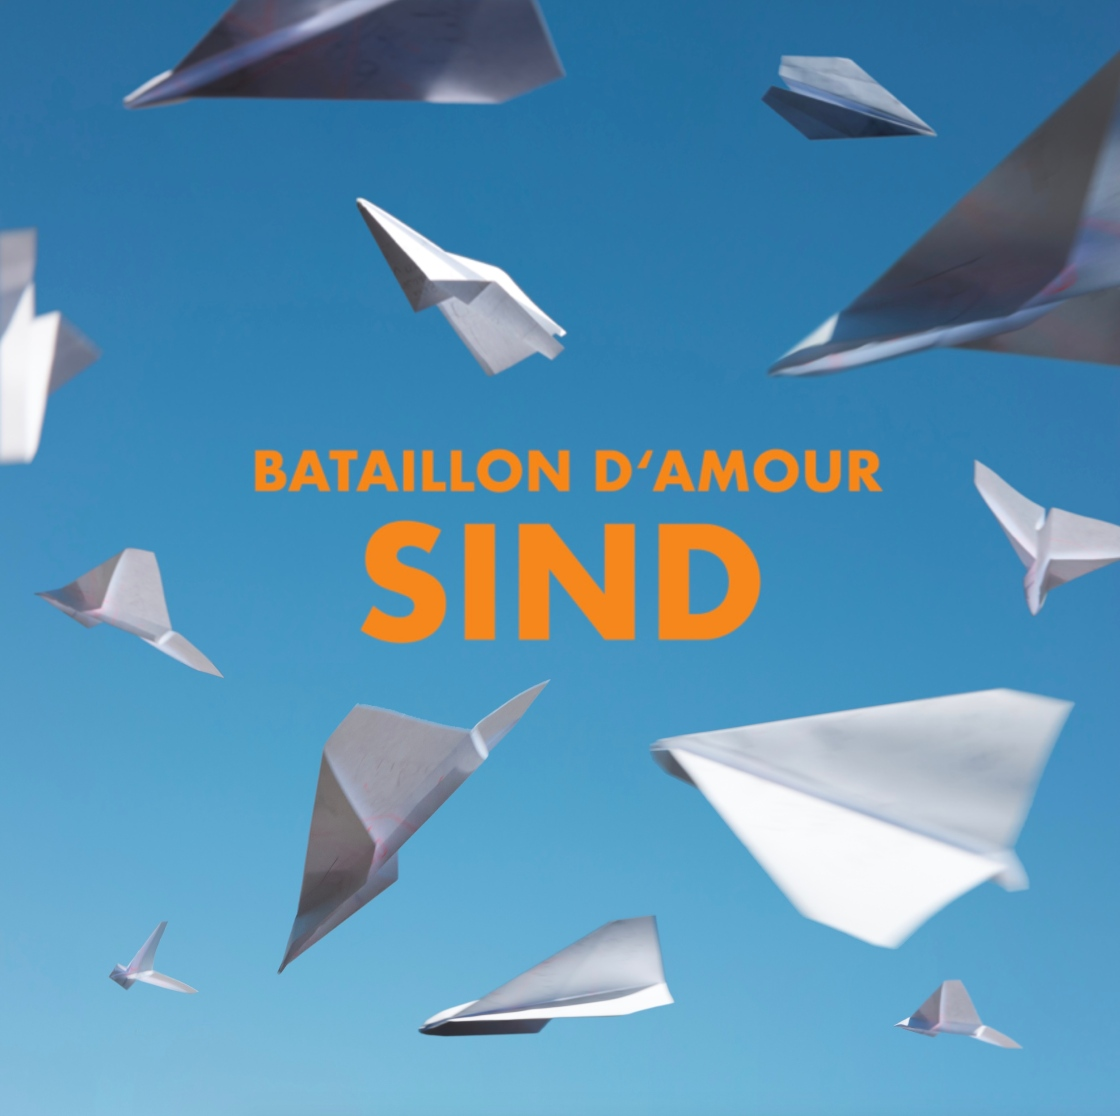 SIND - Batallion d'Amour